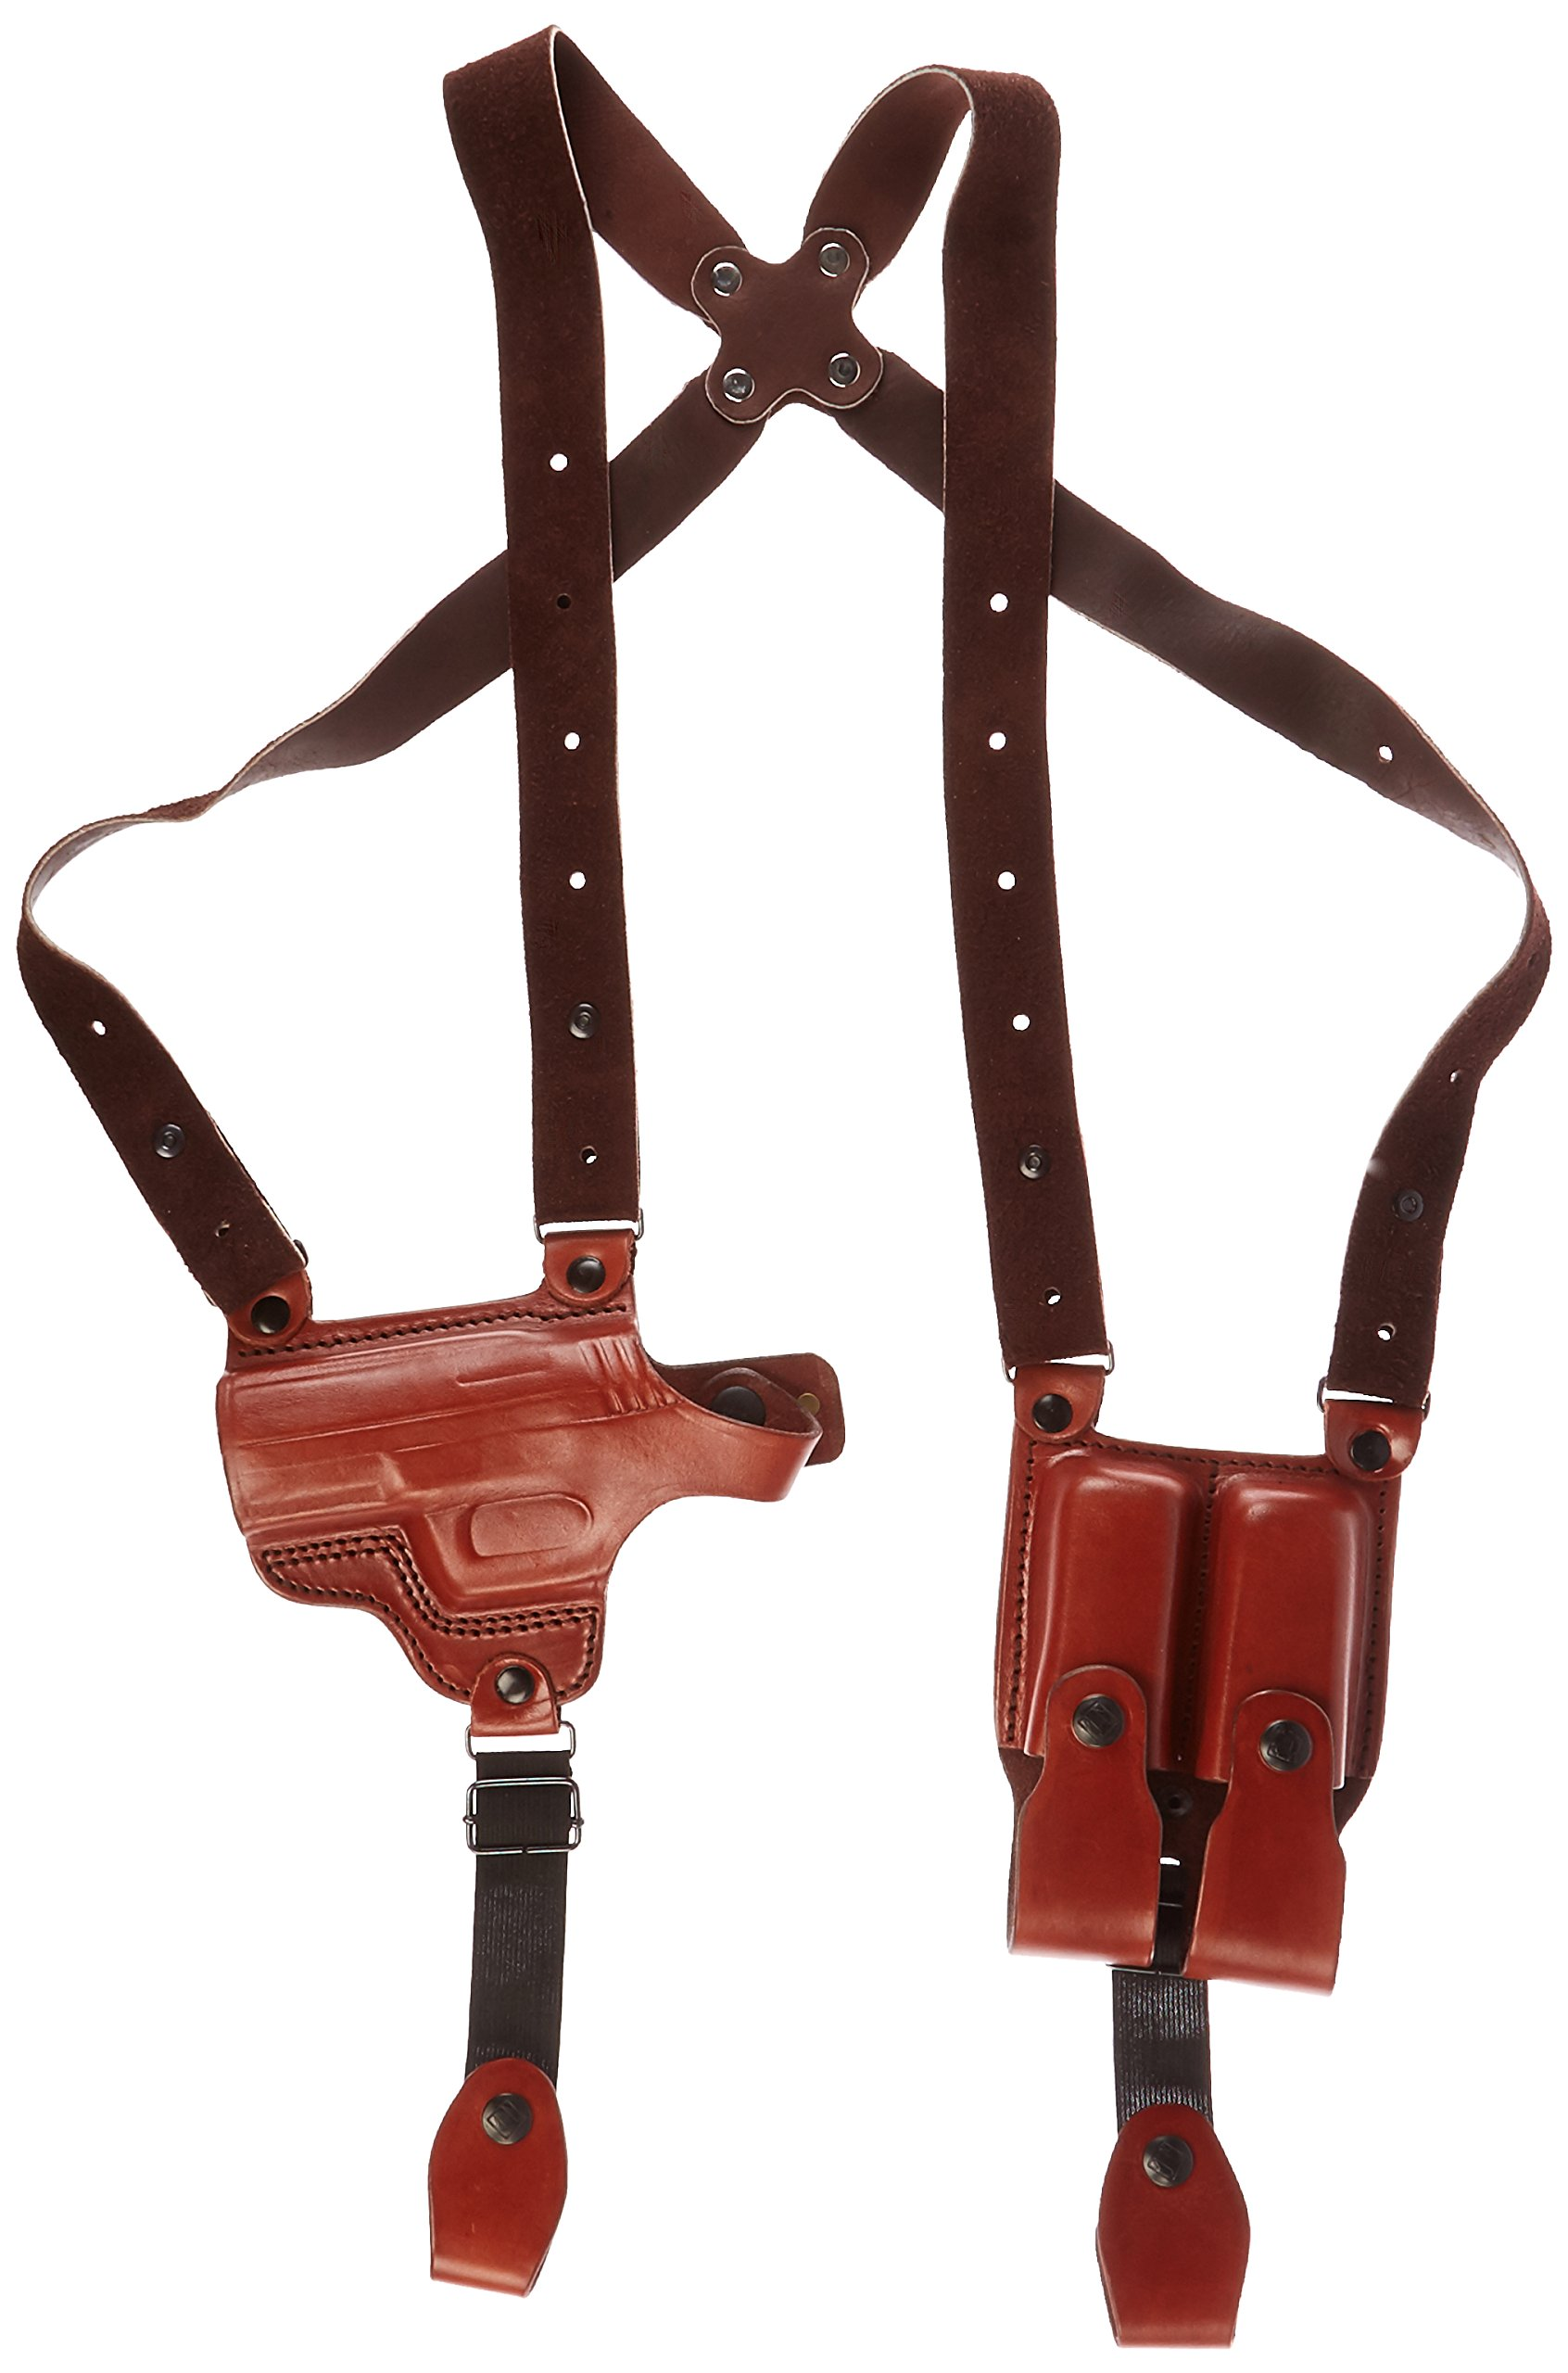 Tagua SH4-1108 Full Slide Shoulder Holster, Walther P99, Brown, Left Hand